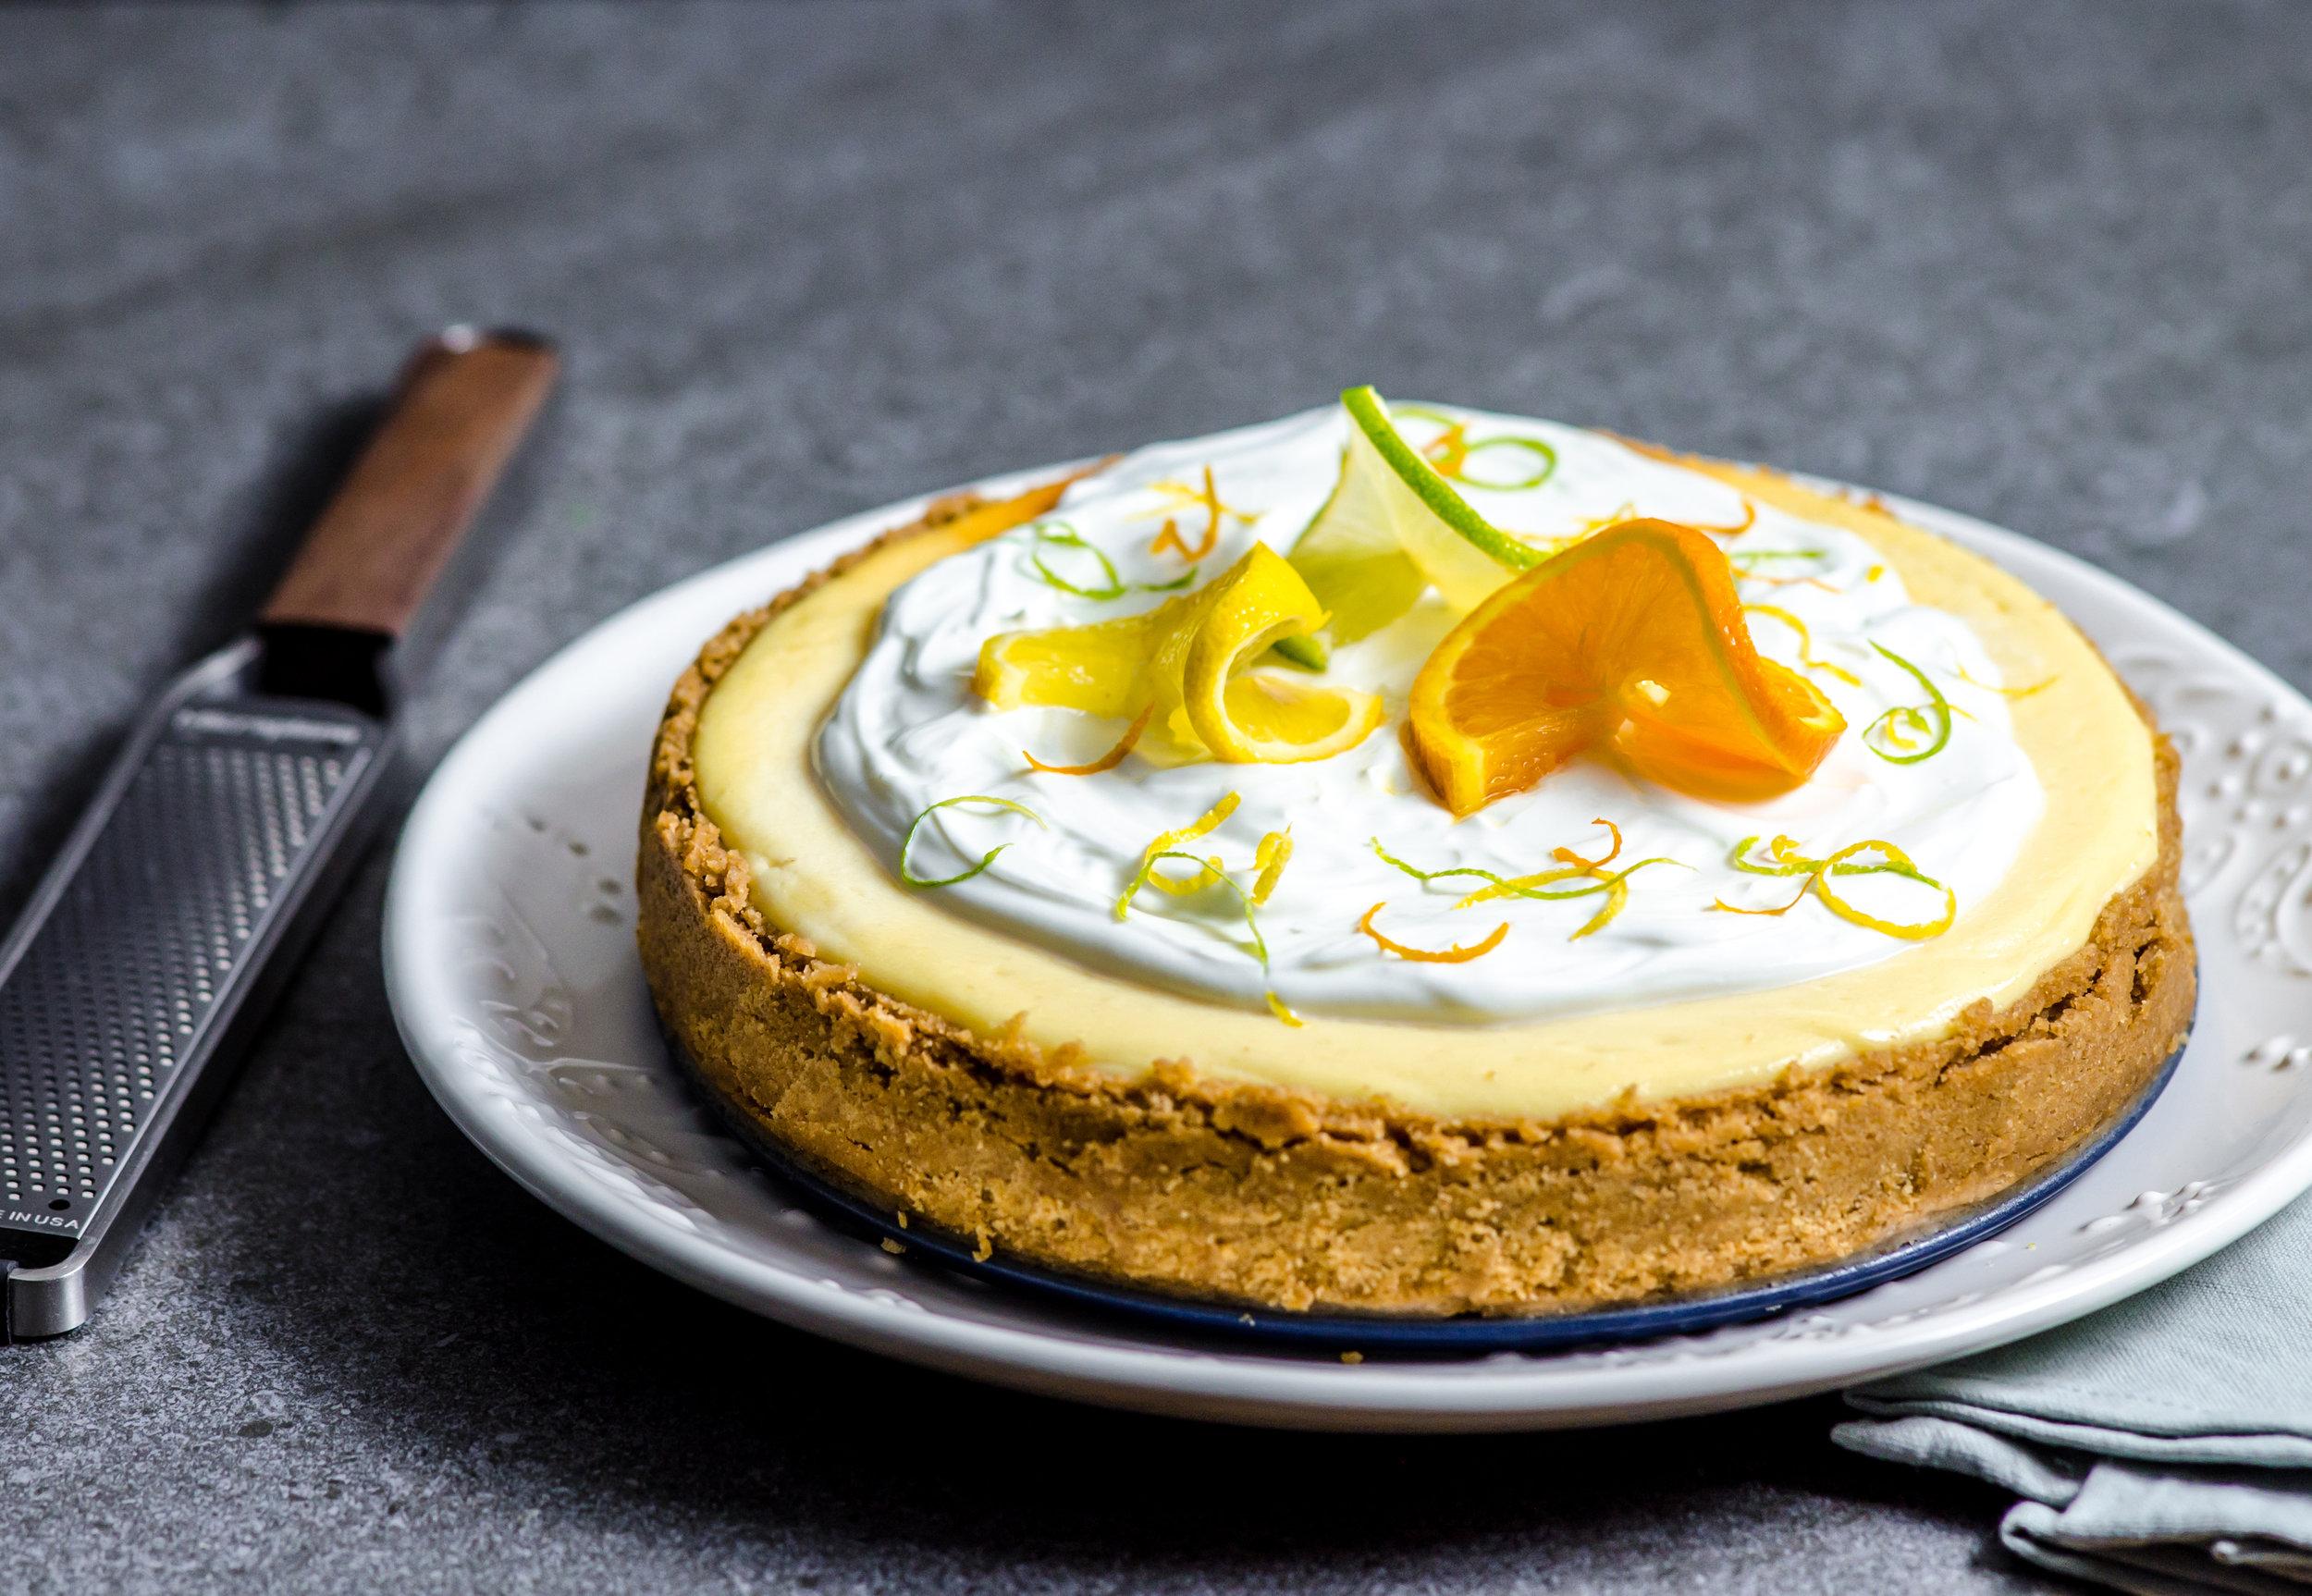 Triple-Citrus-Baked-Cheesecake.jpg